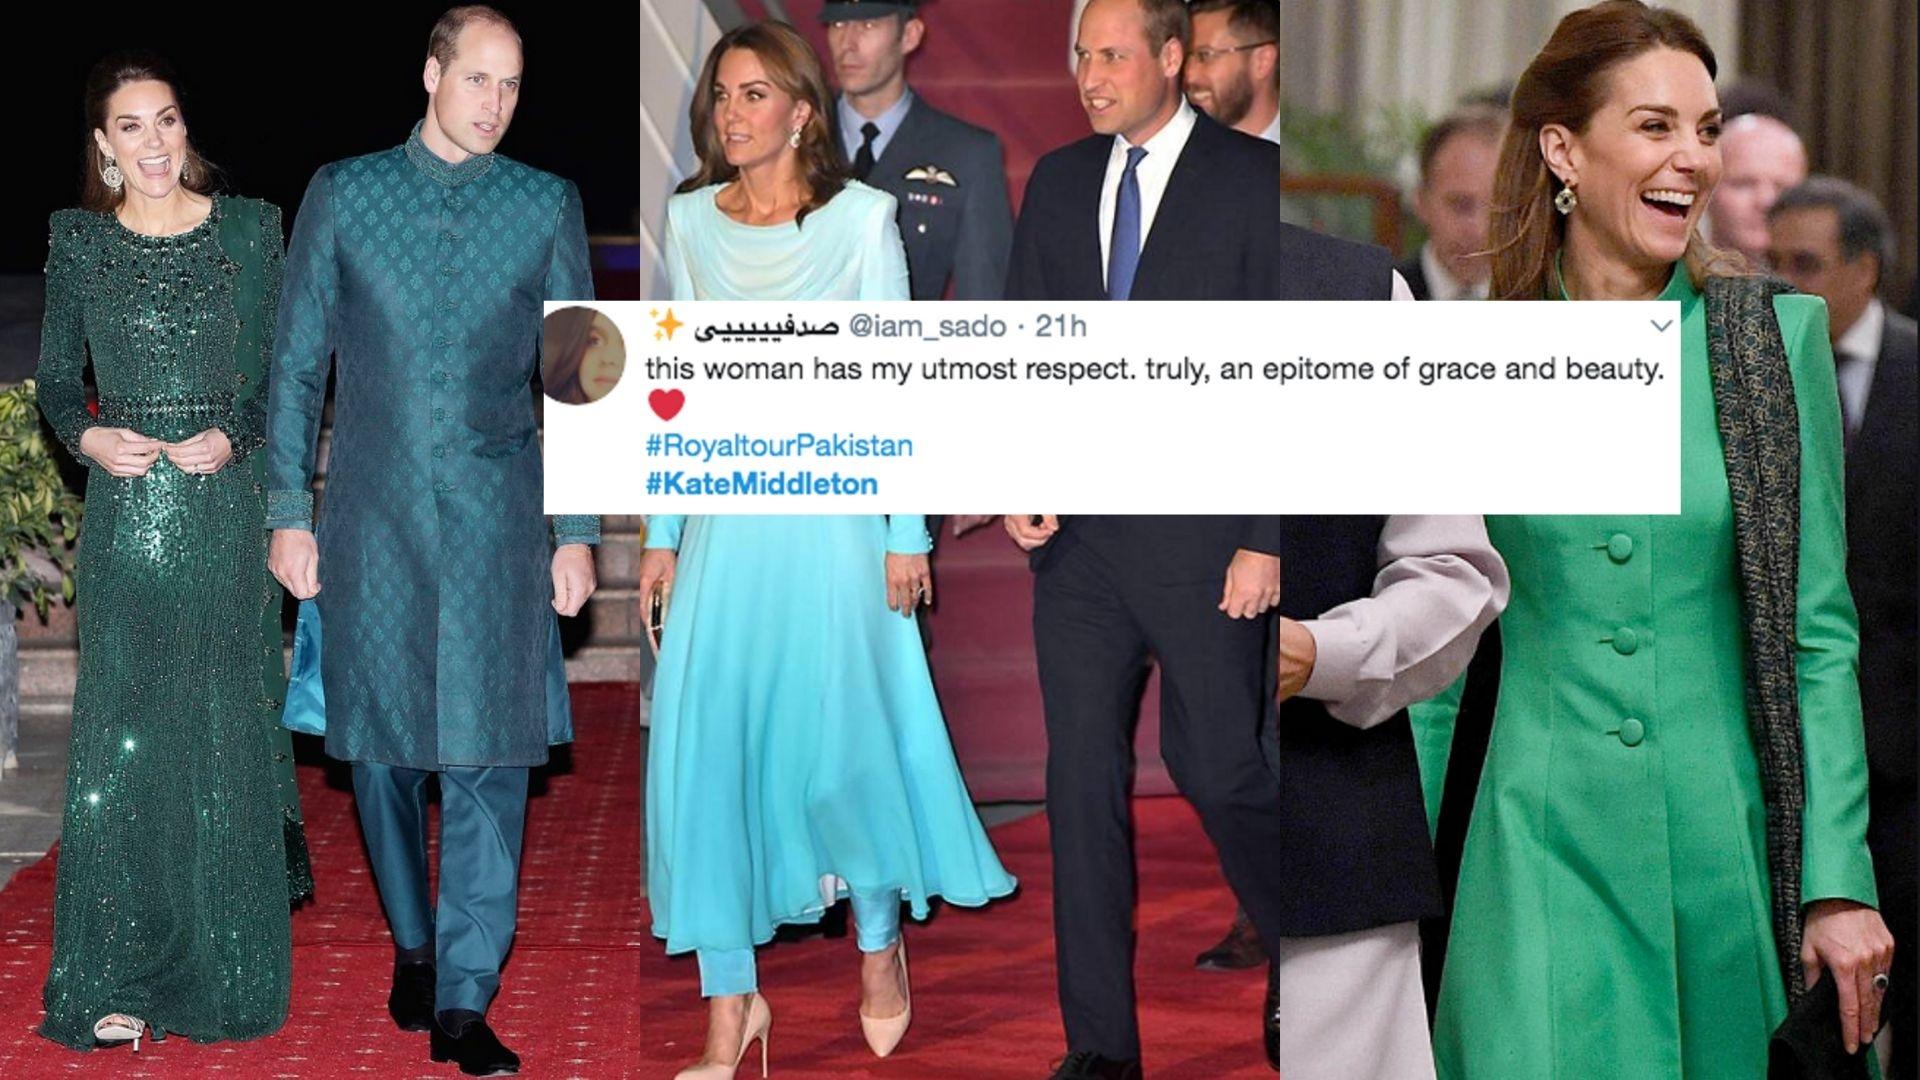 Kate Middleton's Traditional Attires Draw Praise in Pakistan